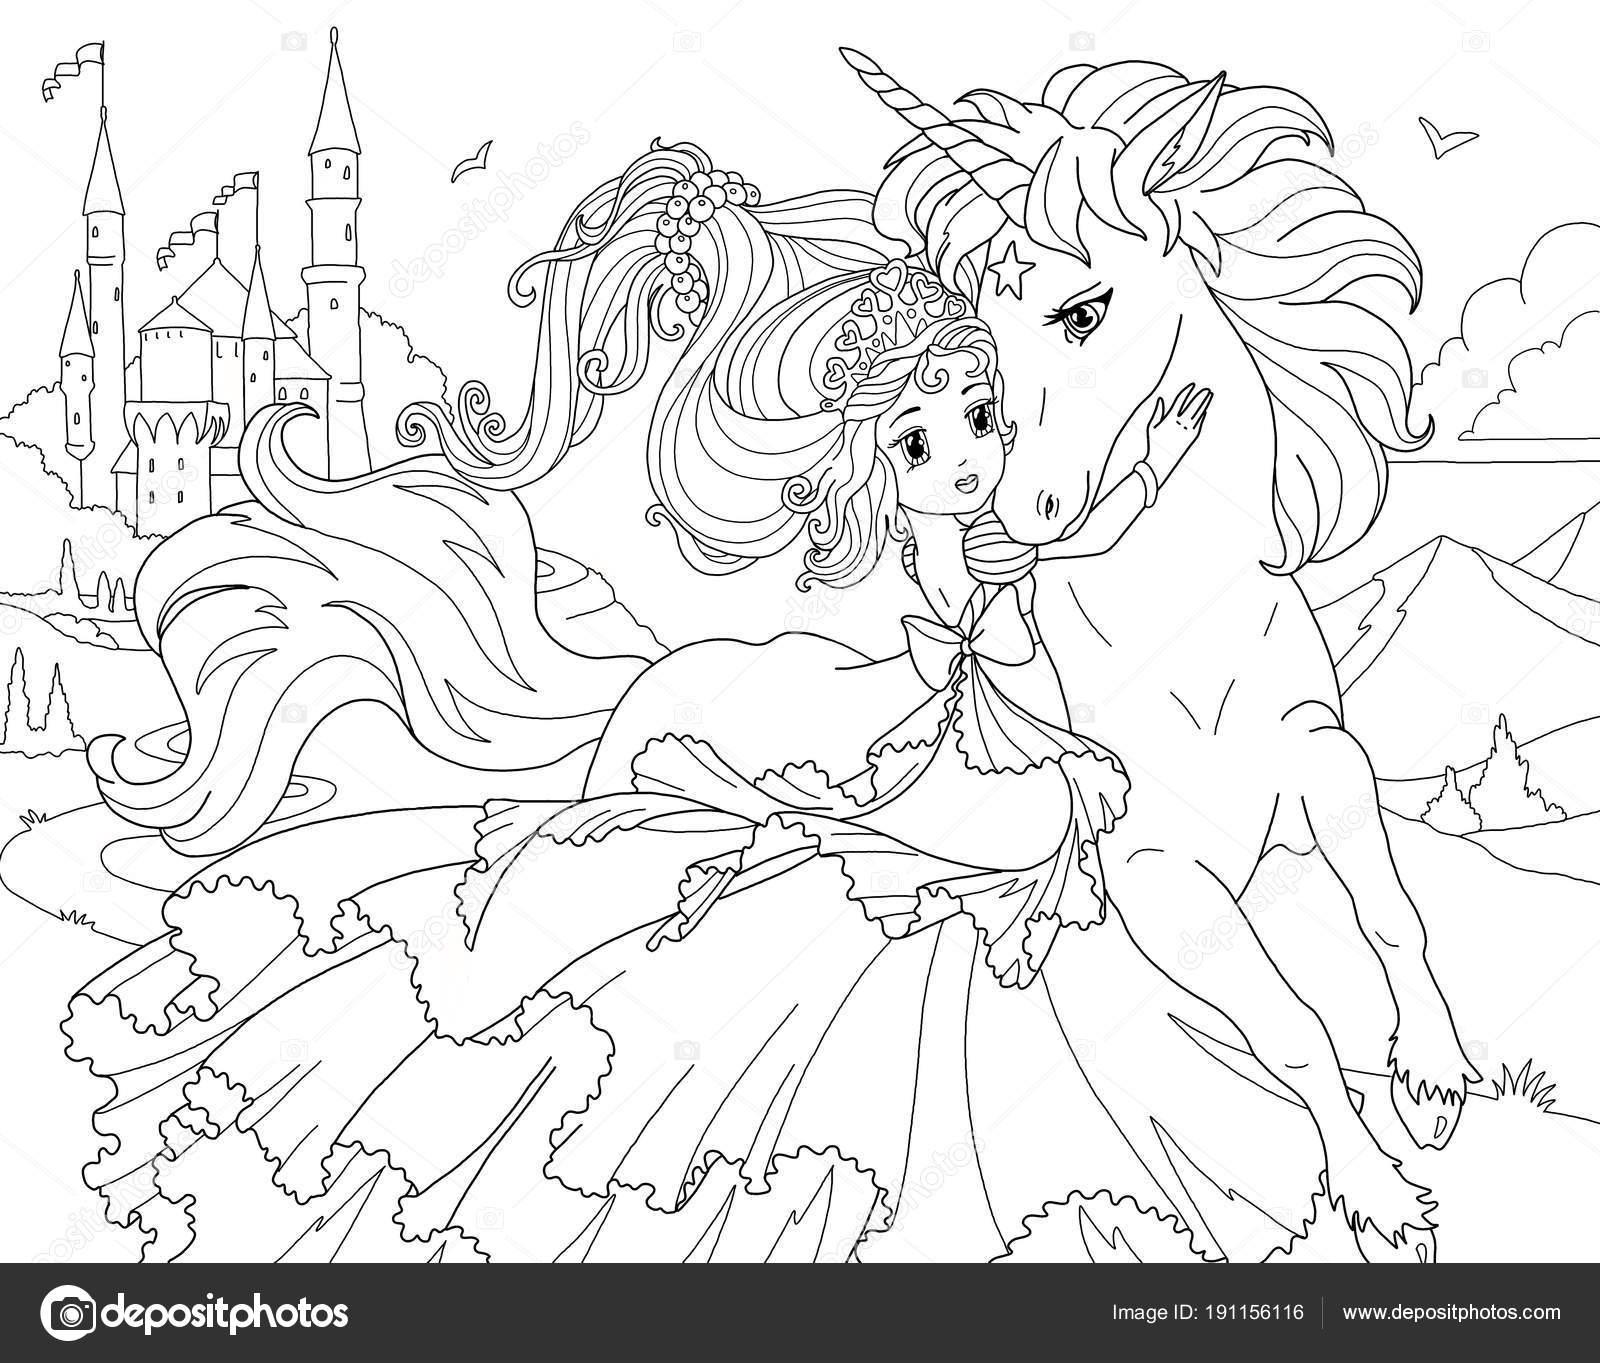 Coloriage Princesse Avec Licorne.Coloriage Licorne Princesse Photographie Larisakuzovkova C 191156116